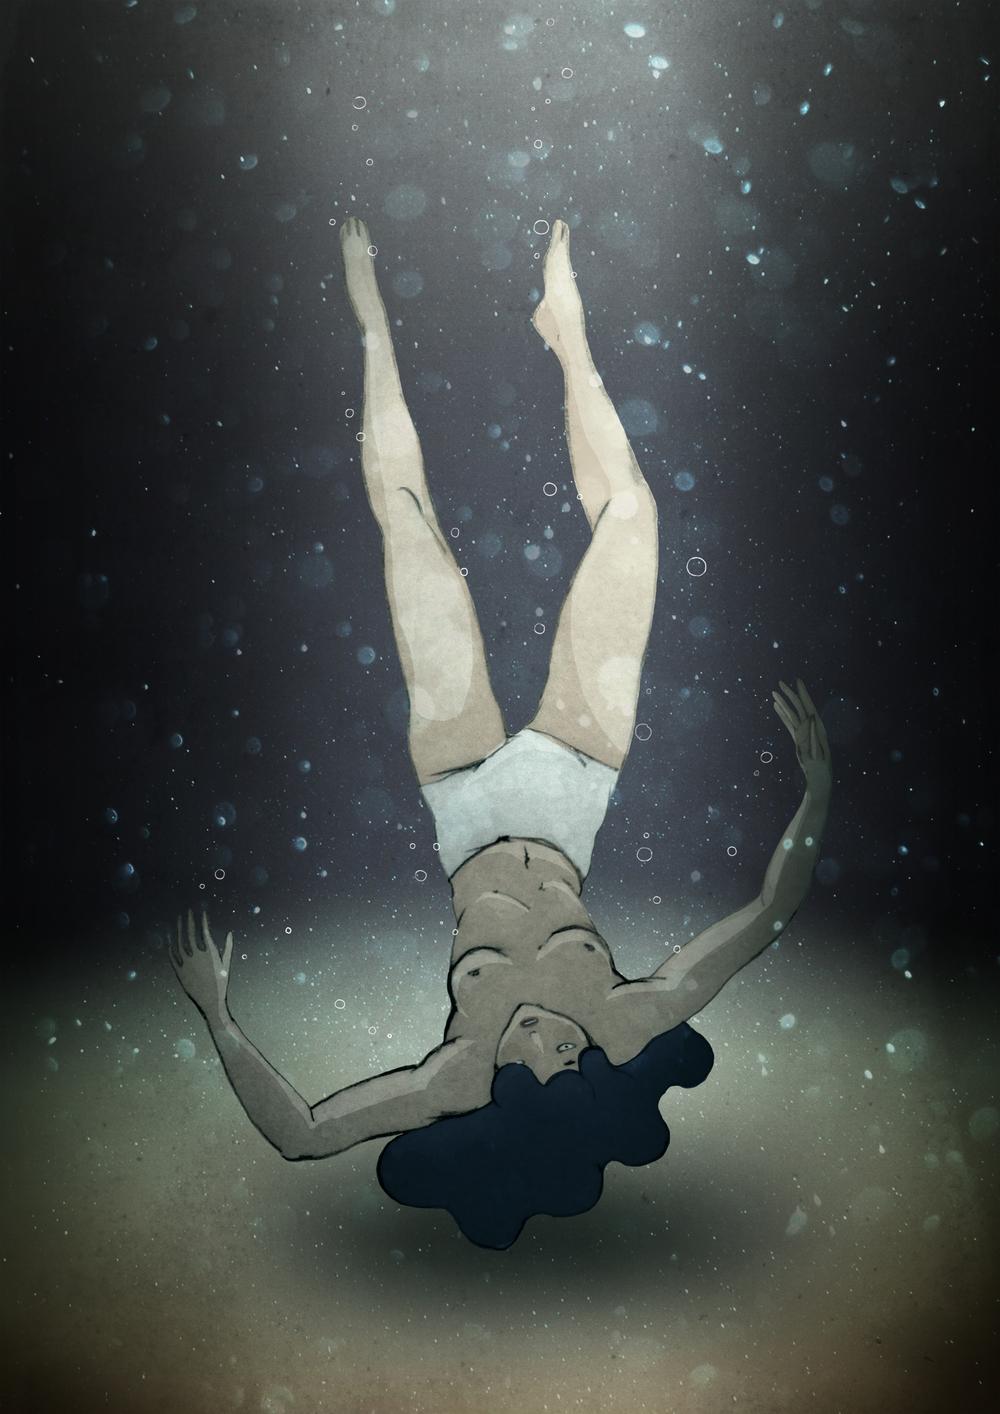 drowning01.jpg